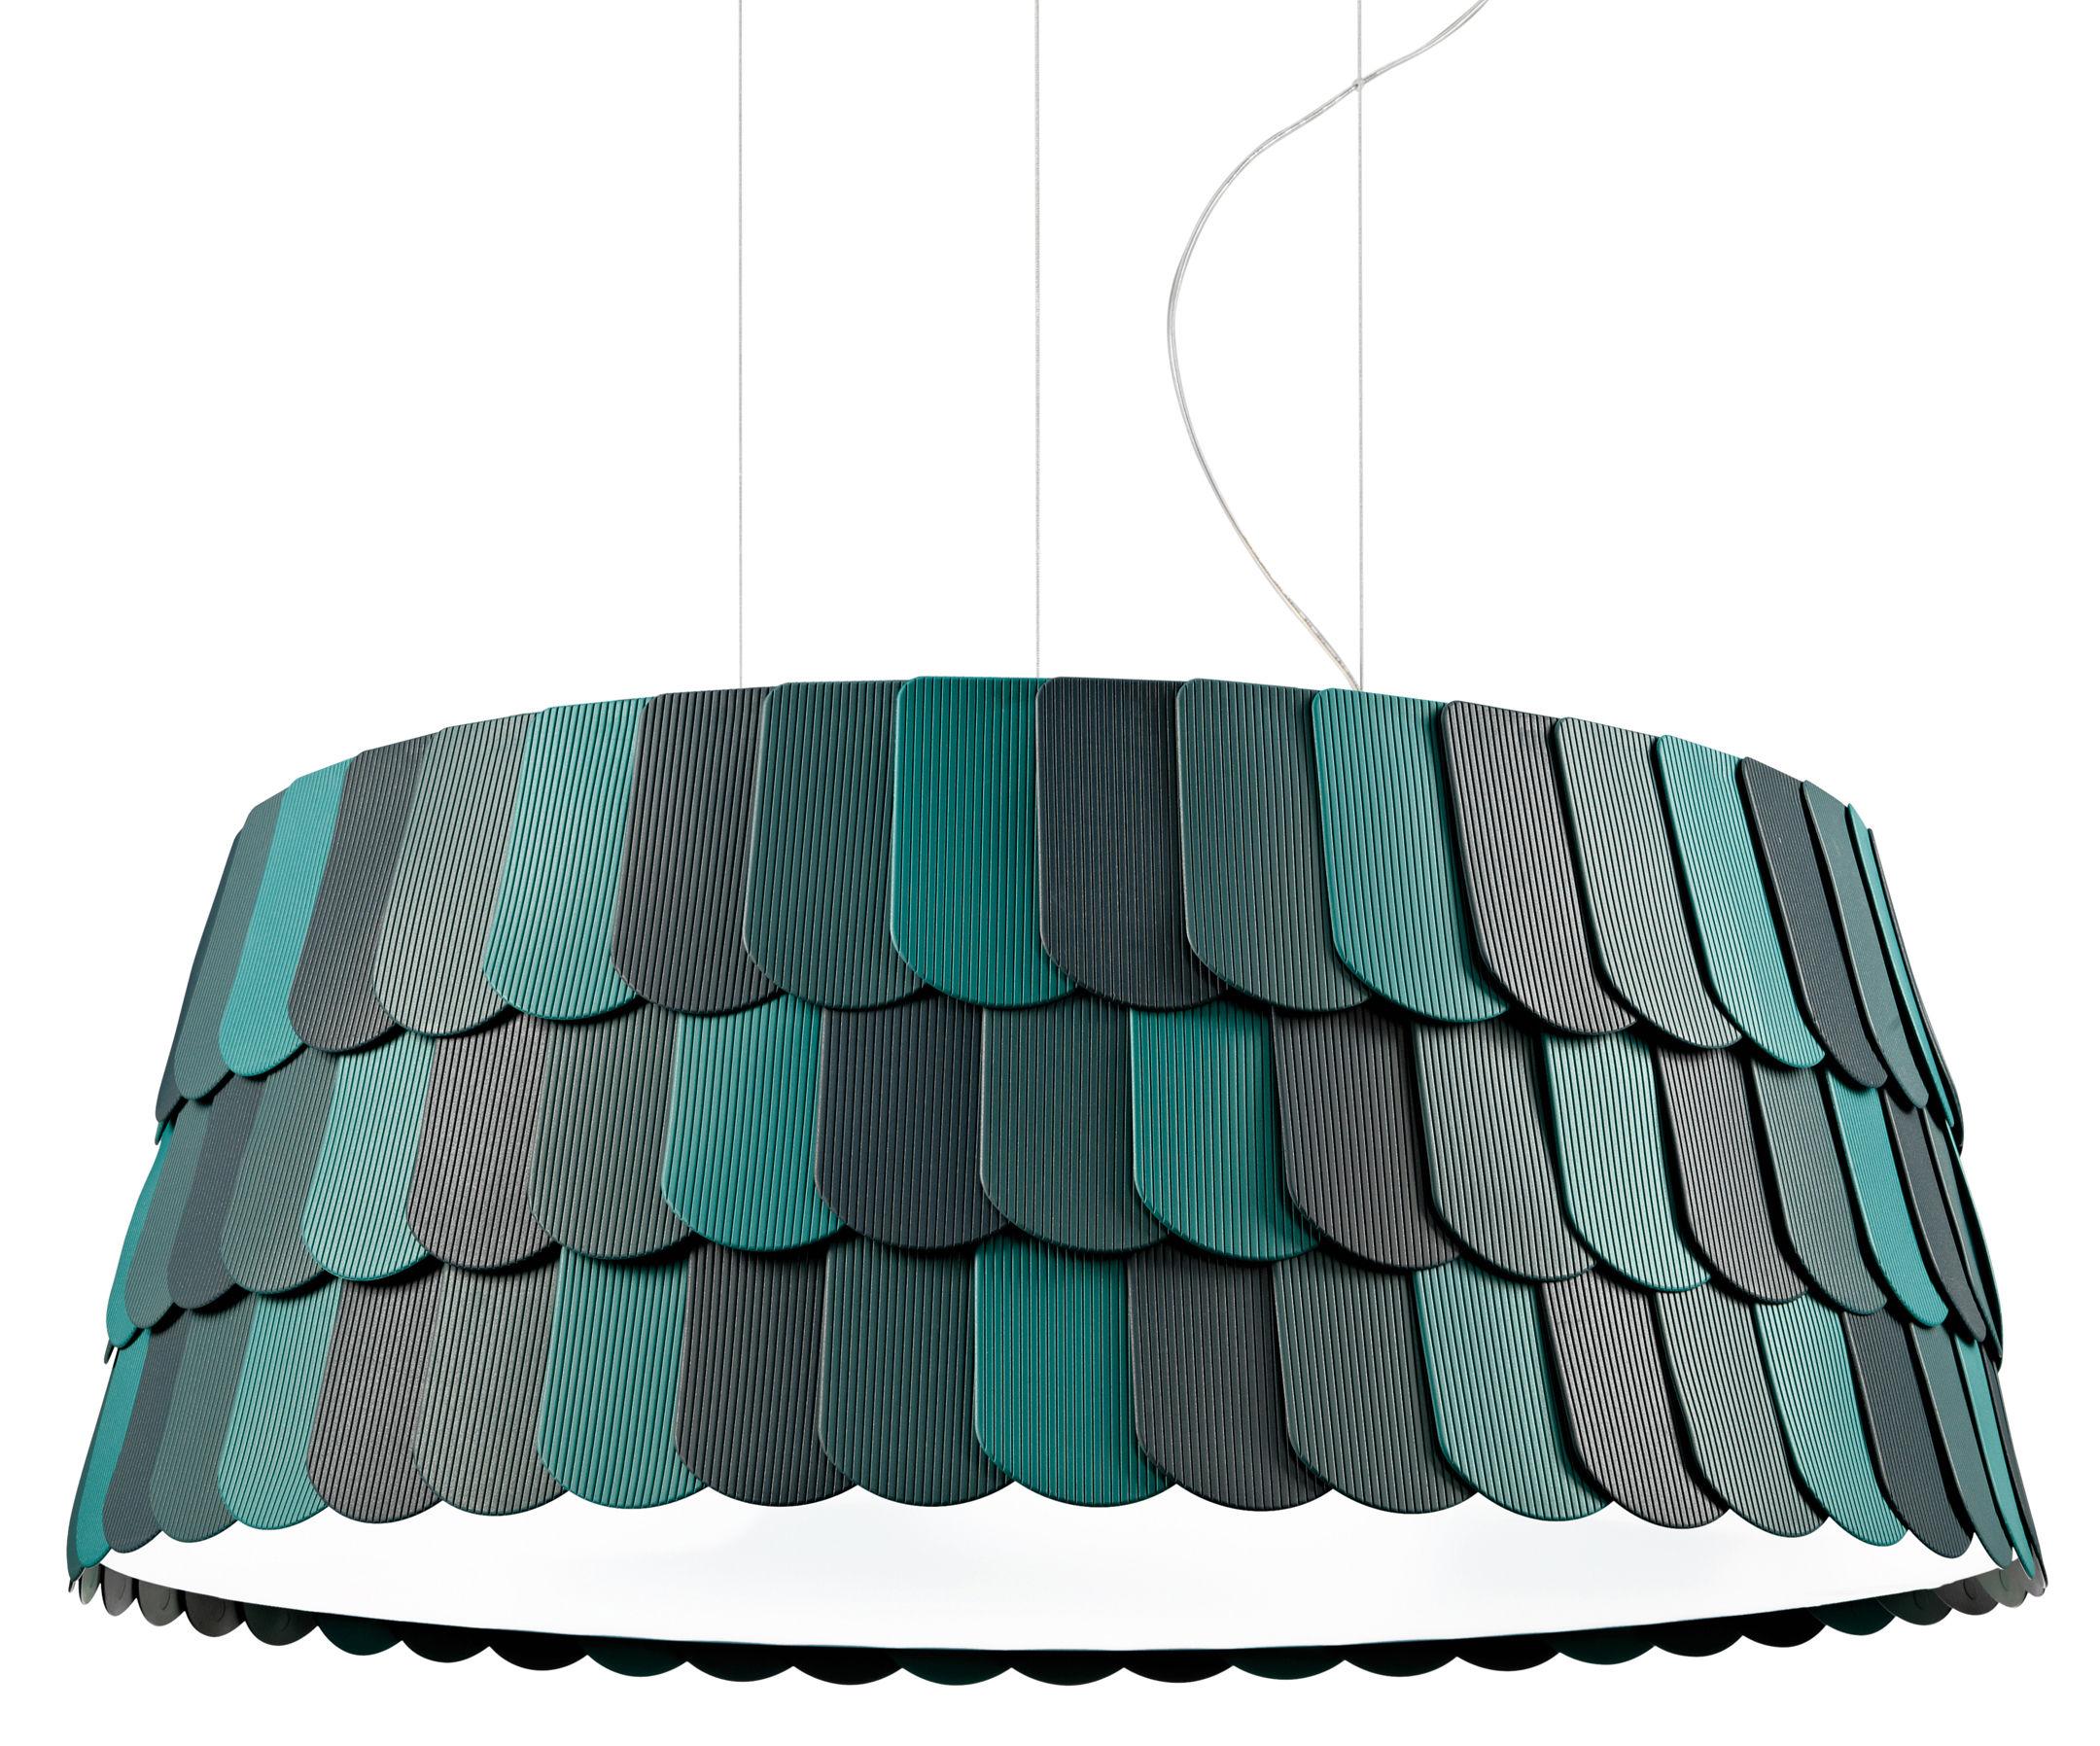 Illuminazione - Lampadari - Sospensione Roofer - Ø 79 x H 32 cm di Fabbian - Vere - Gomma